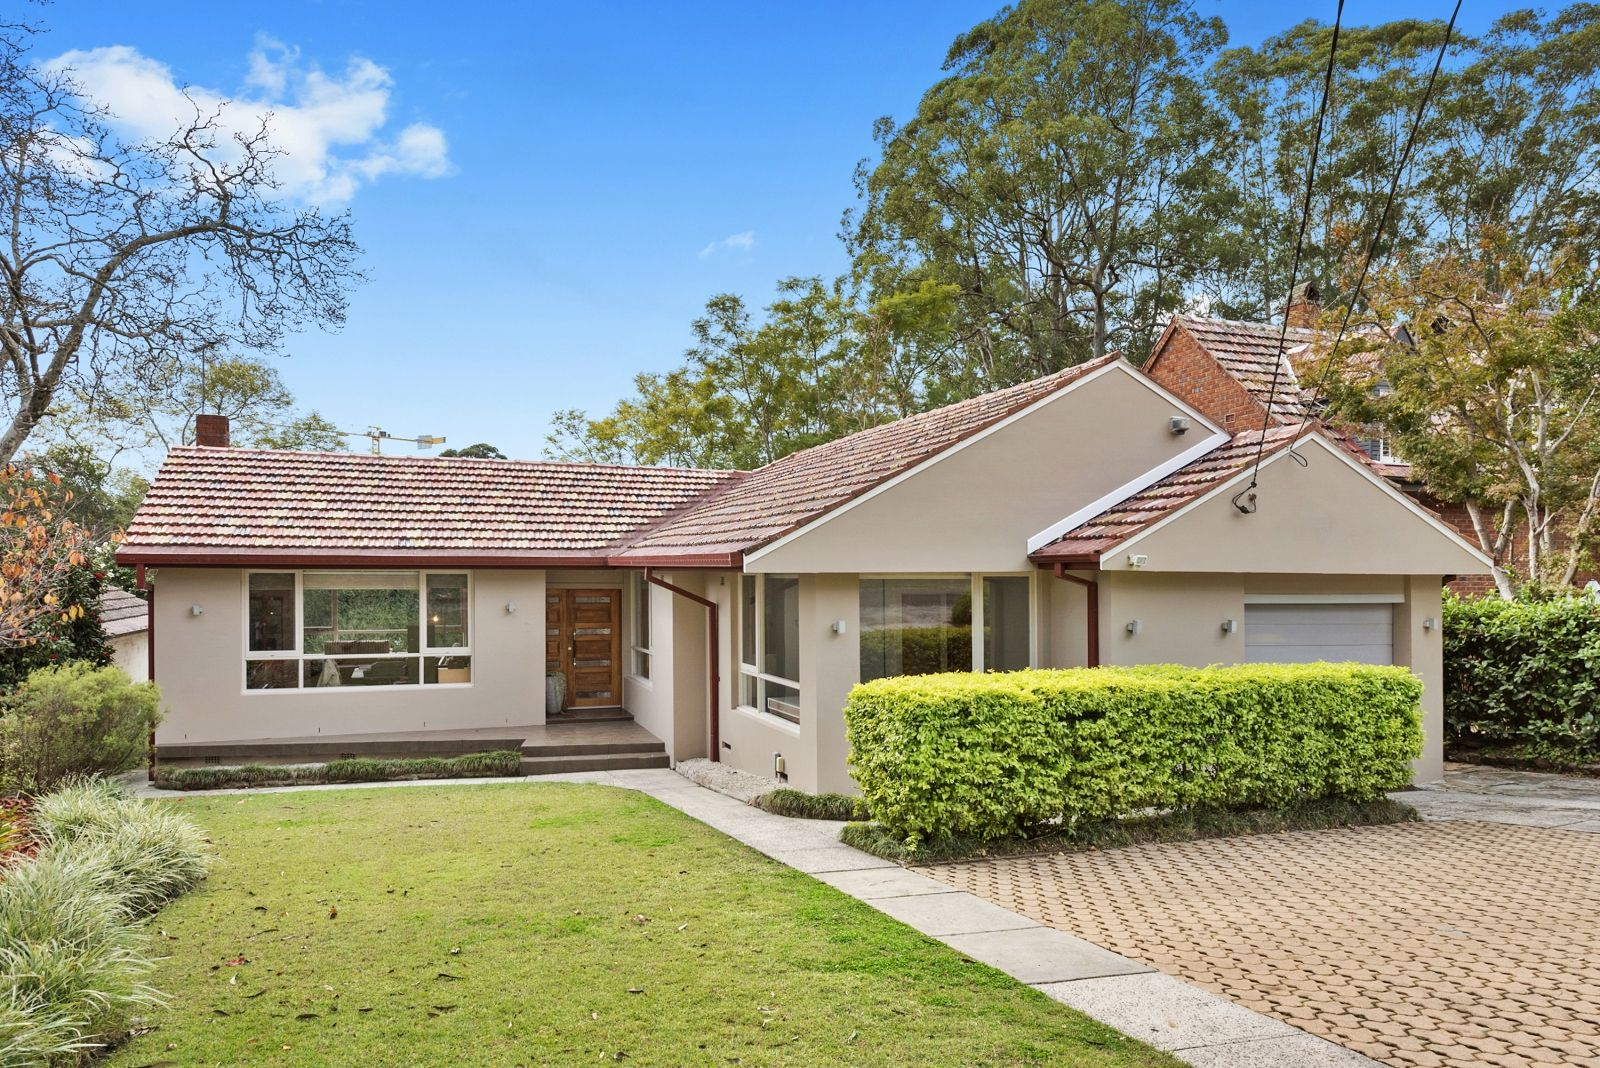 7 Pentecost Avenue, St Ives NSW 2075, Image 0